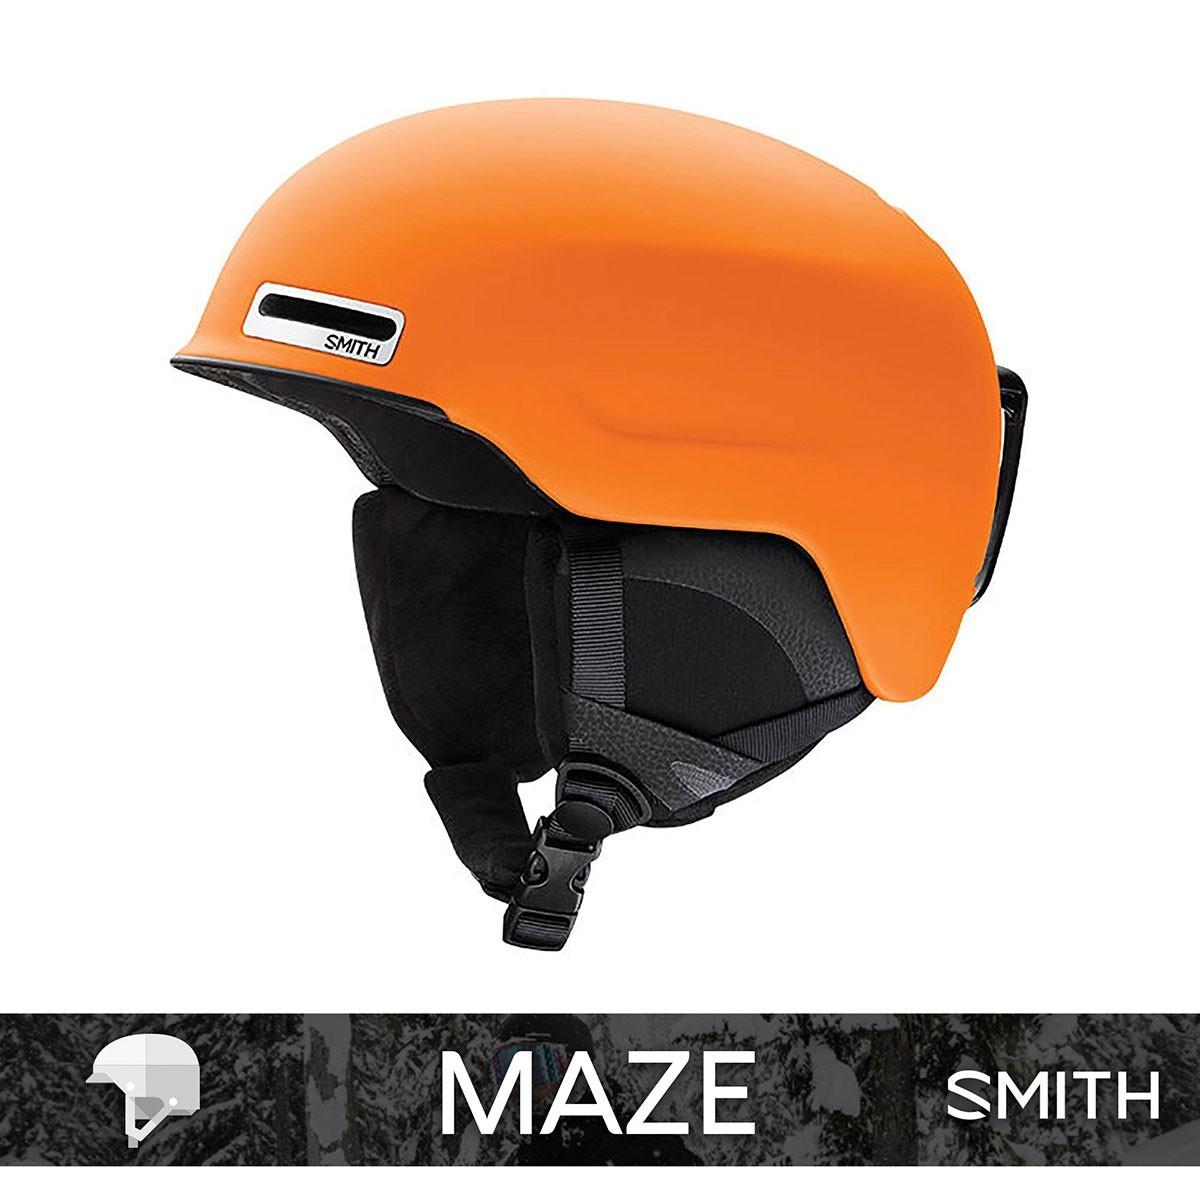 SMITH MAZE matte Solar - Изображение - AQUAMATRIX